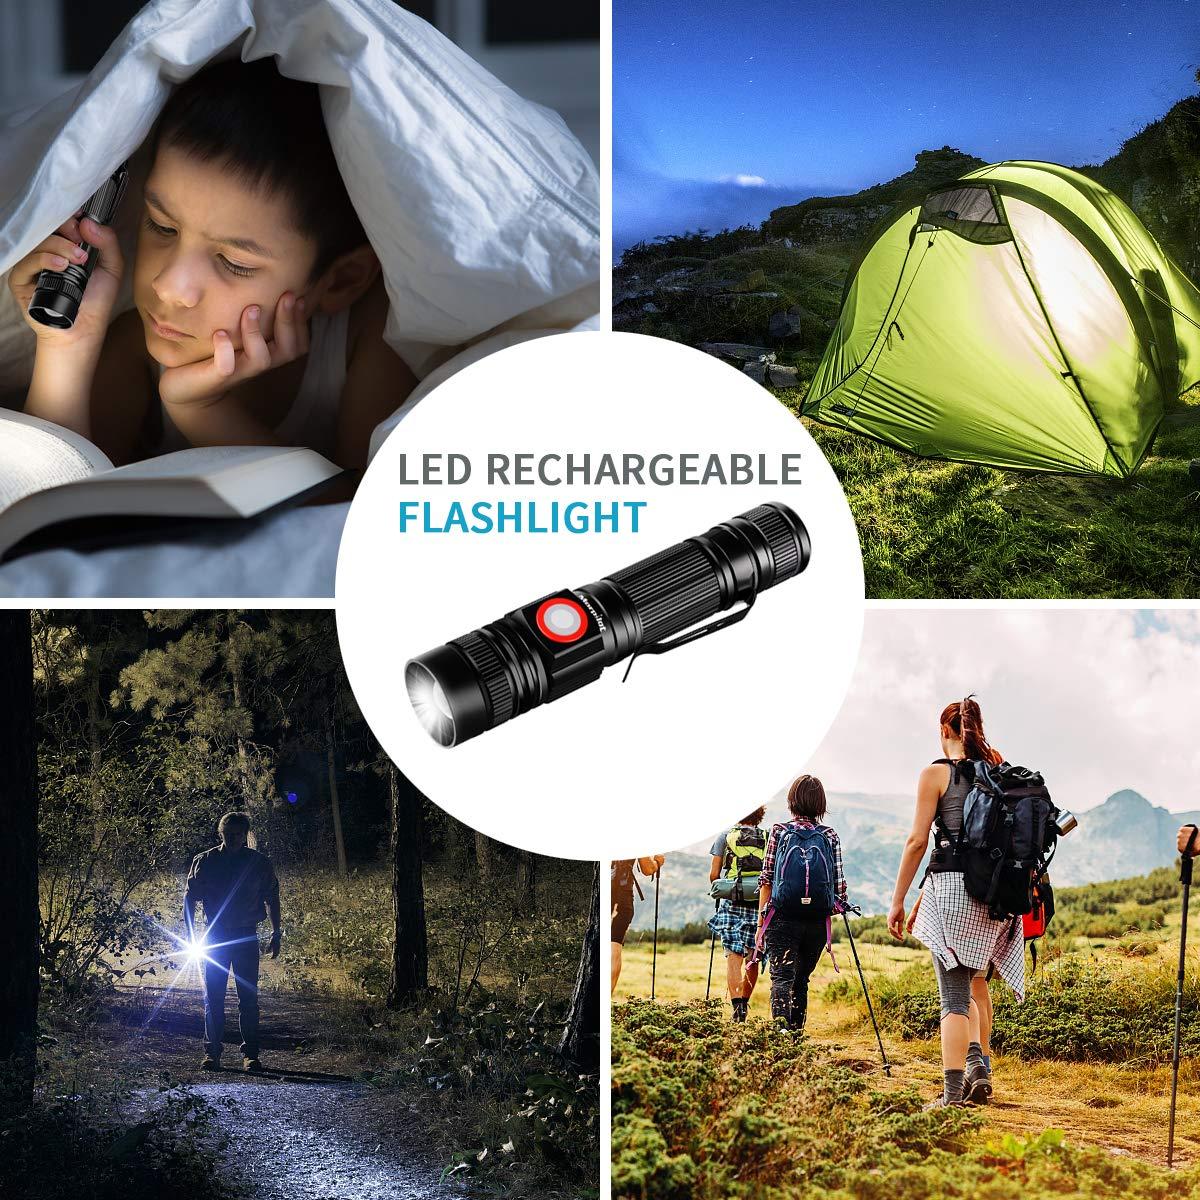 Linterna USB, Morpilot Linterna Recargable con Cable USB, Linterna LED Tácica Militar con 18650 Batería Incorporada incluida, Alcance 350m 5 Modos Zoomable, Resistente Impermeable